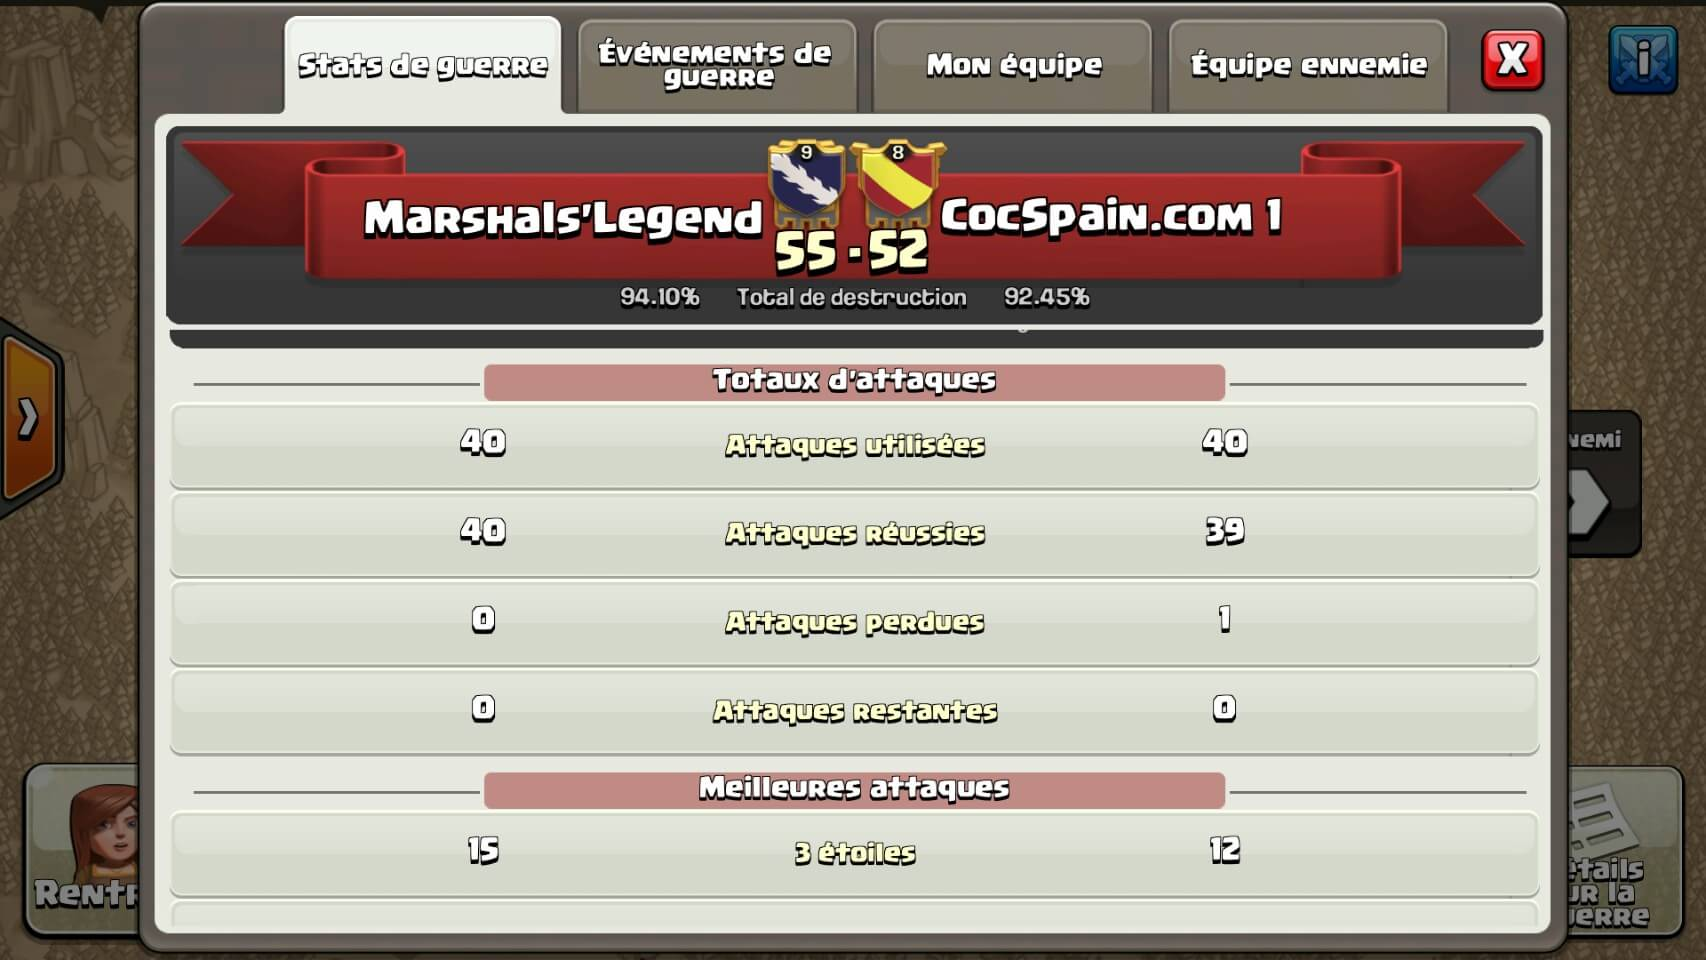 War Cocspain.com 1 Win 150.jpg